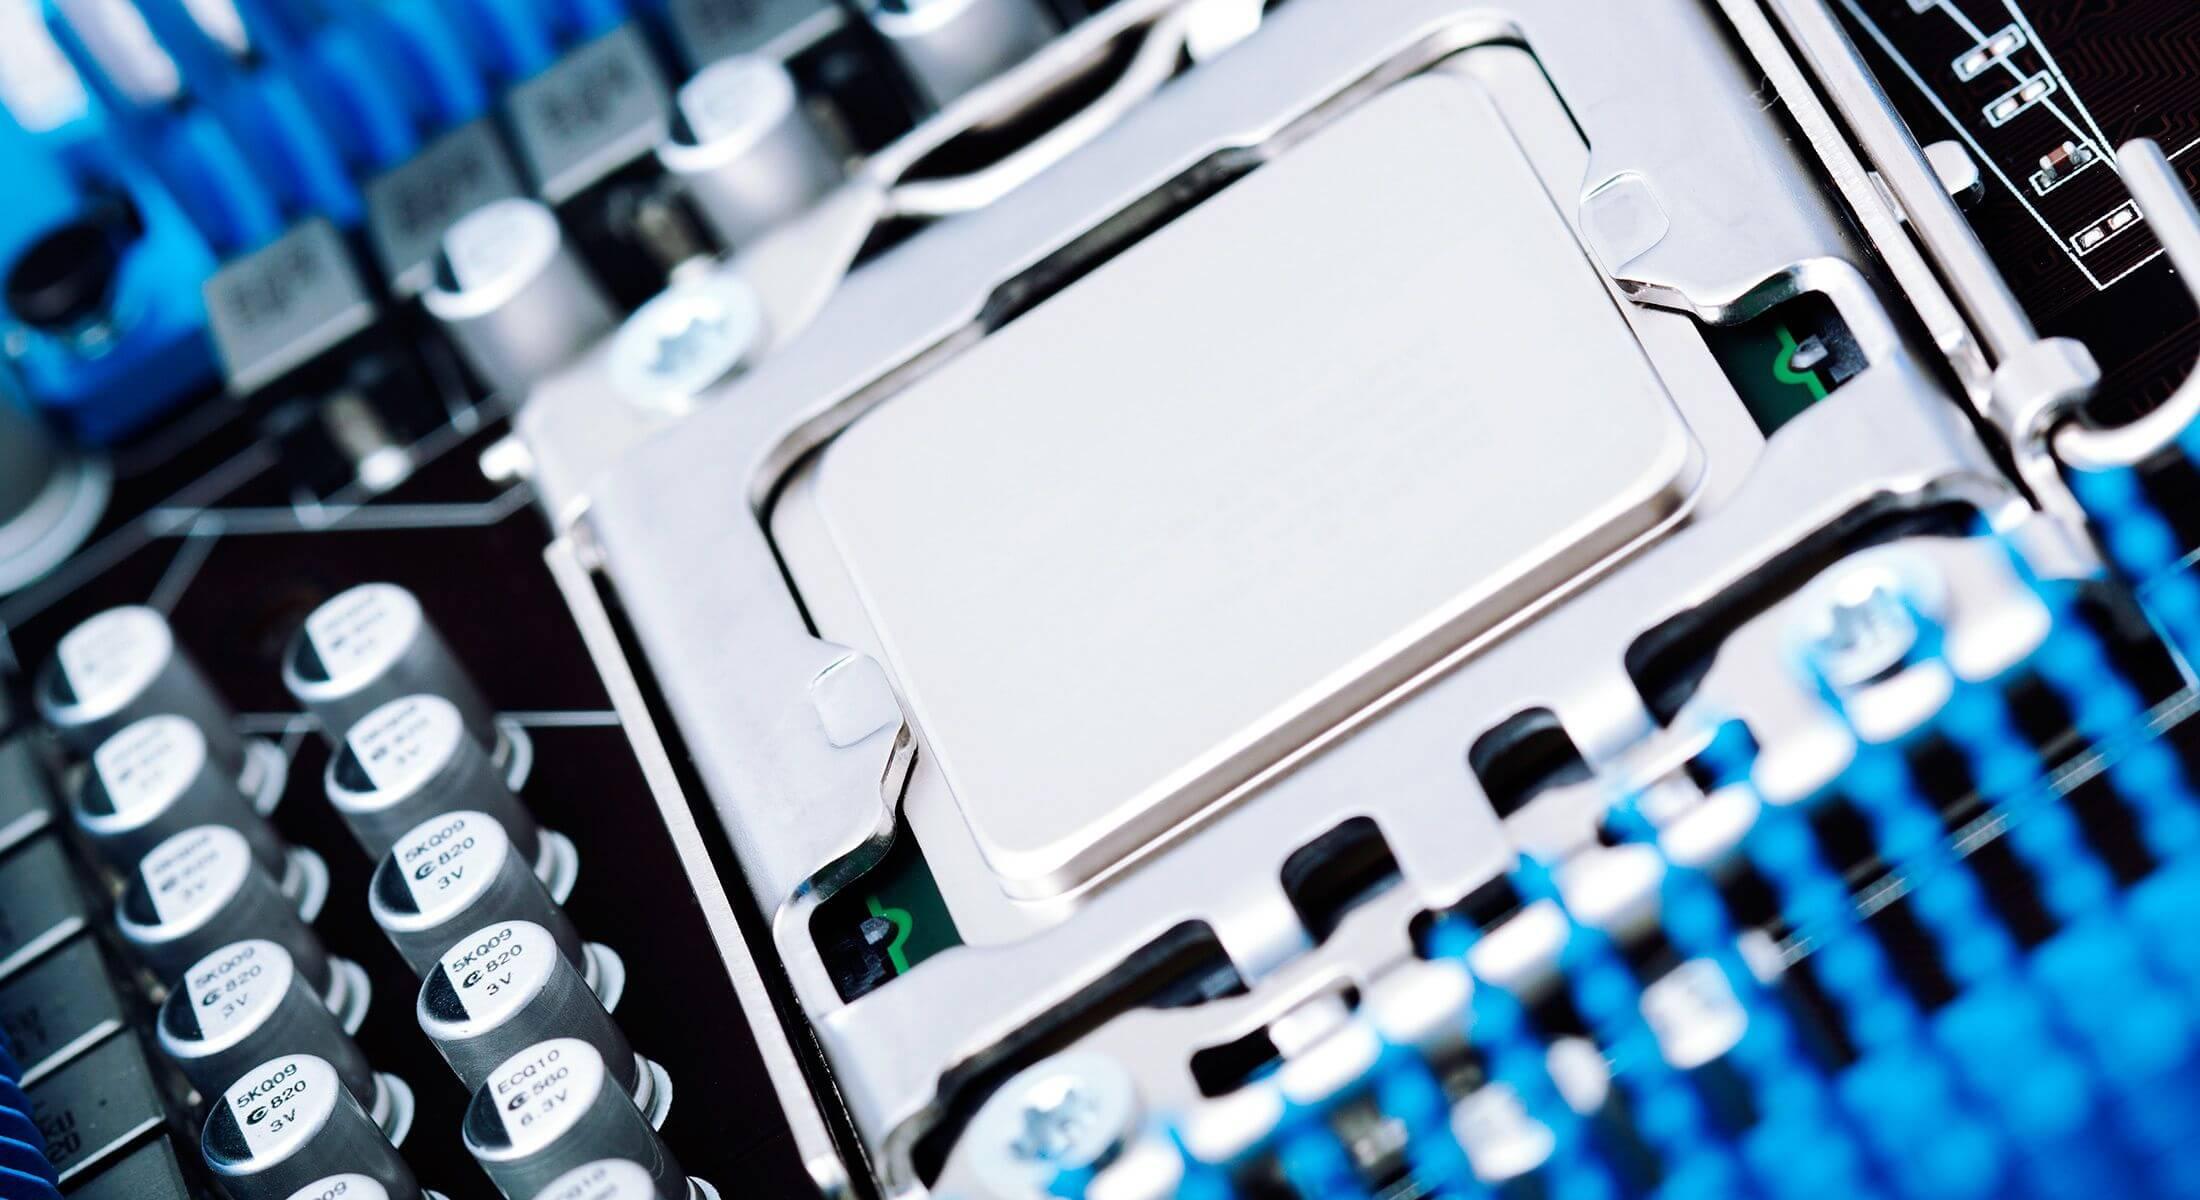 Computer processor in socket